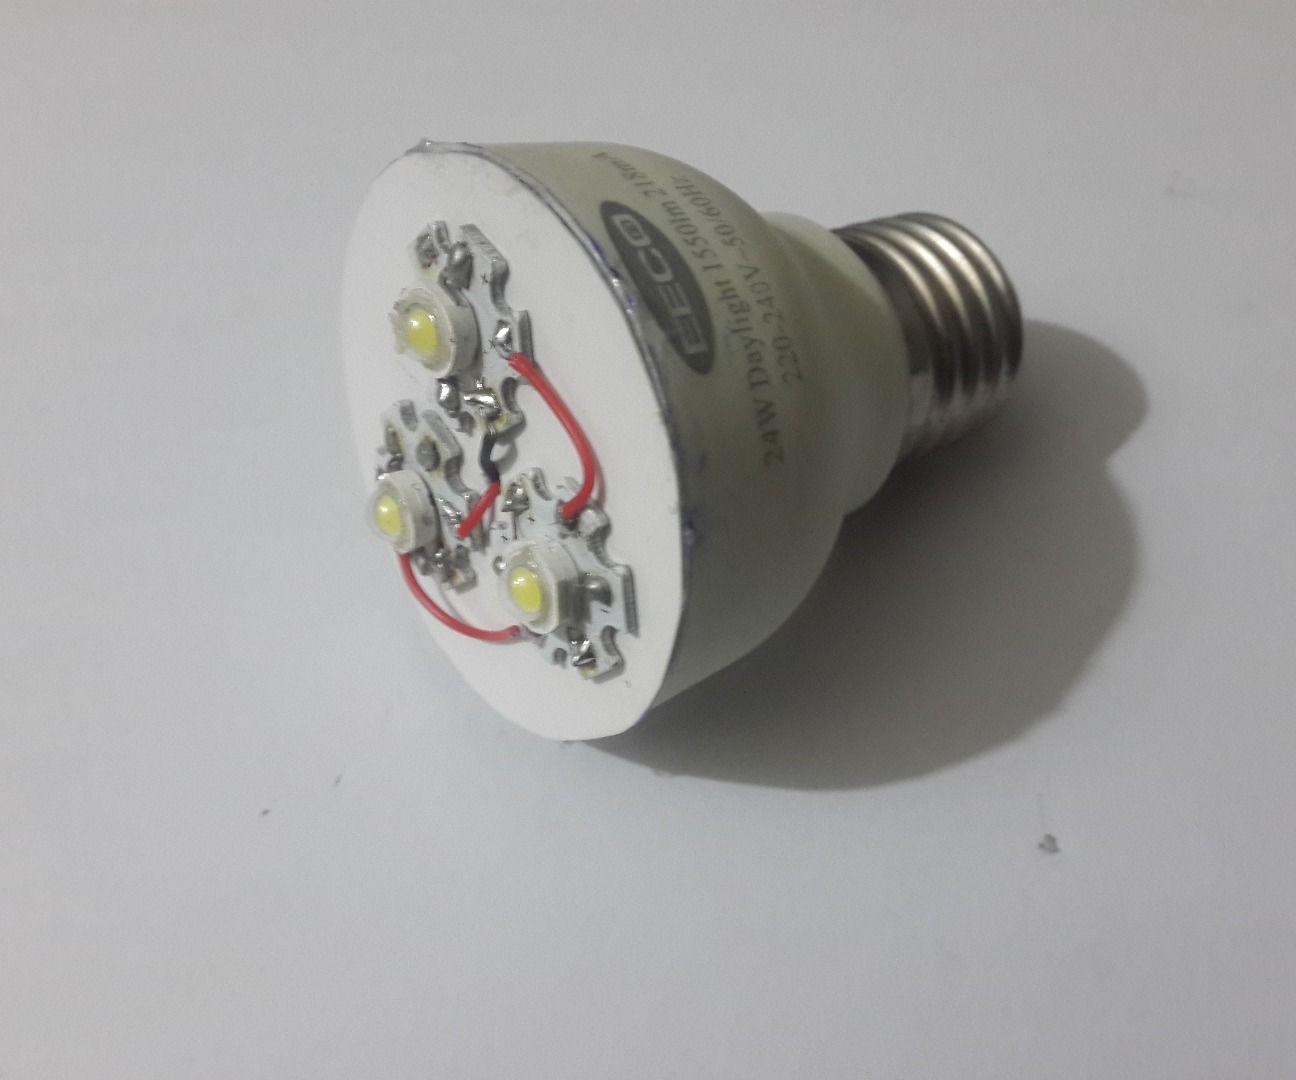 3 Watt Energy Saver